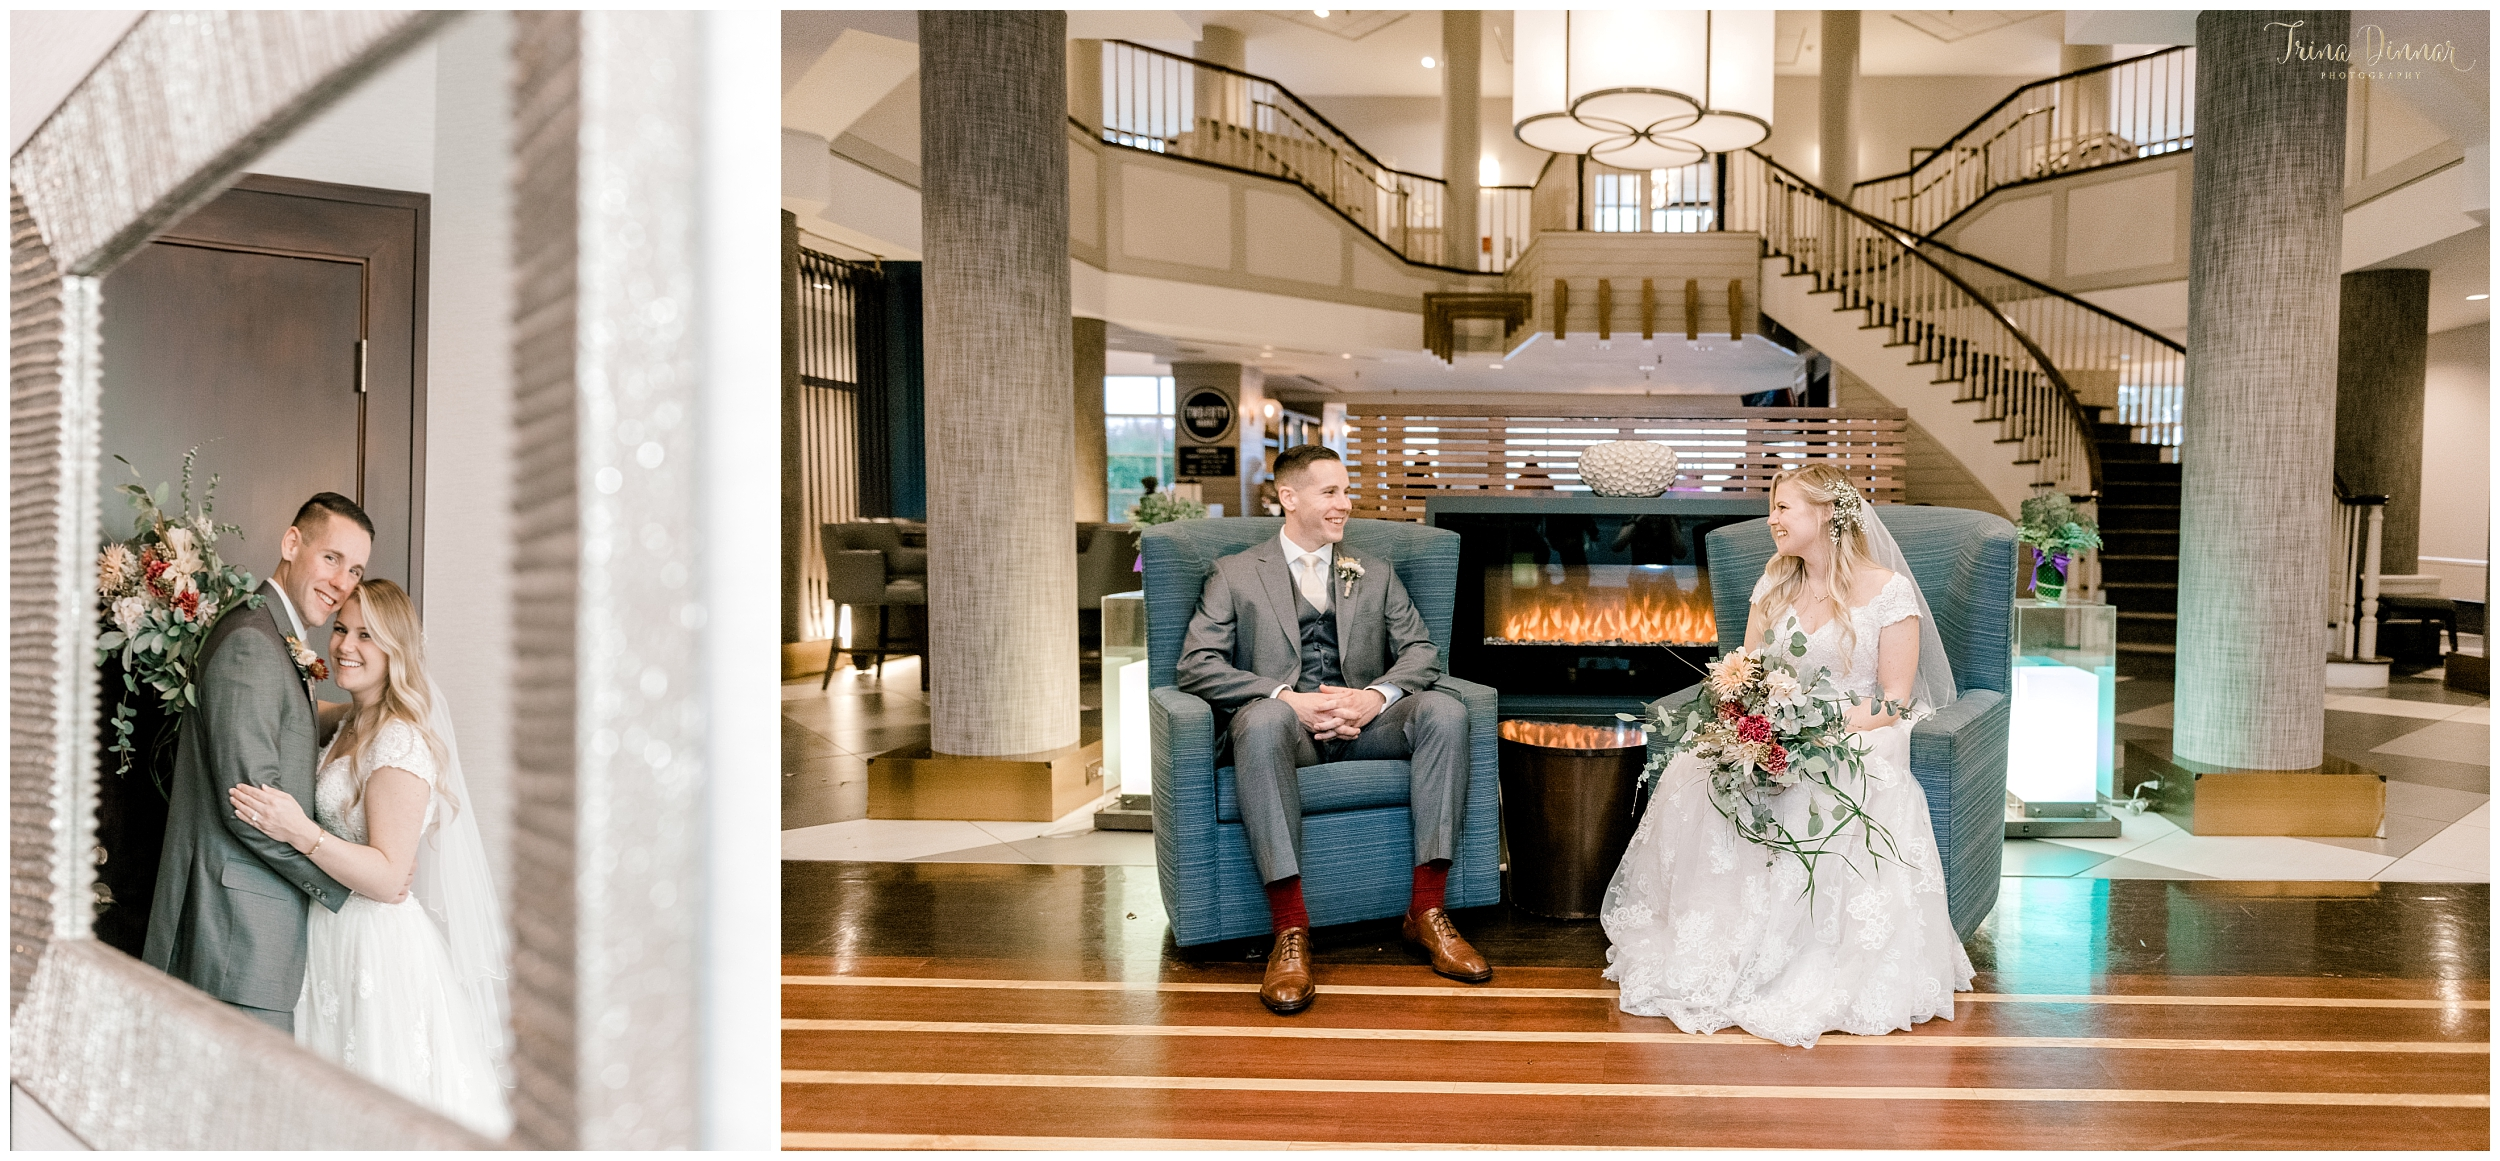 Sheraton Hotel Portsmouth NH Wedding Photography